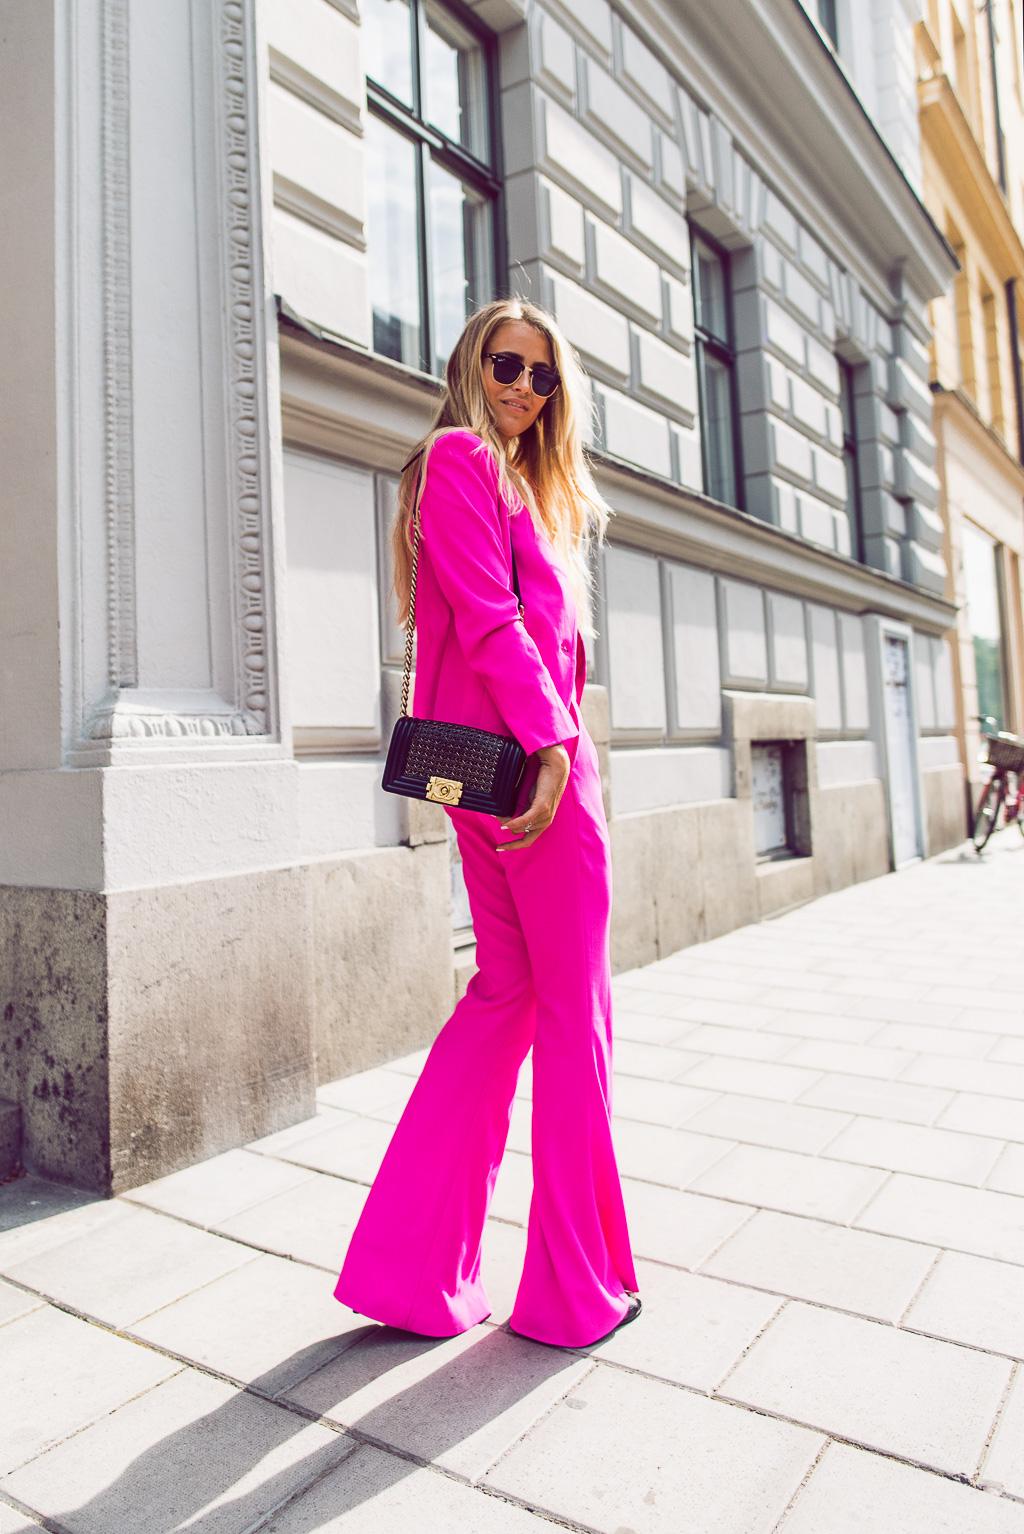 janni-deler-pink-suit-bymalinasDSC_2319-Redigera